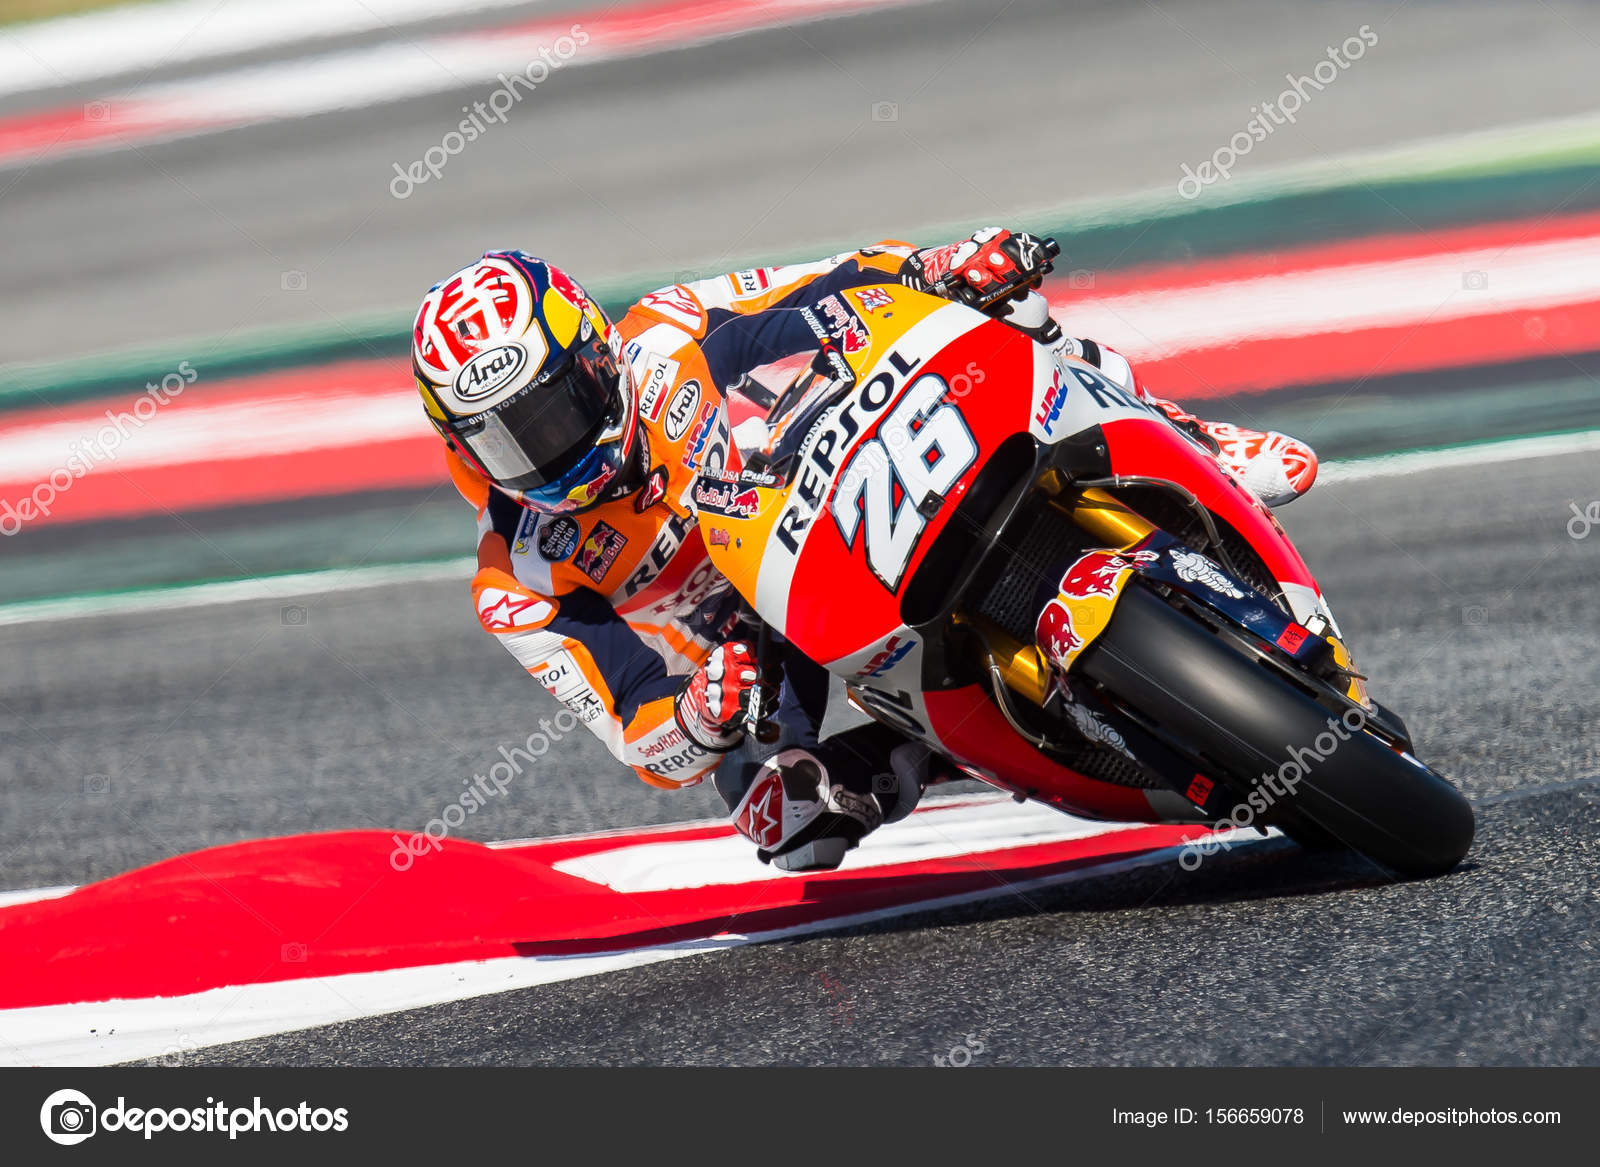 Gp Catalunya Moto Gp Dani Pedrosa Repsol Honda Team Stokovoe